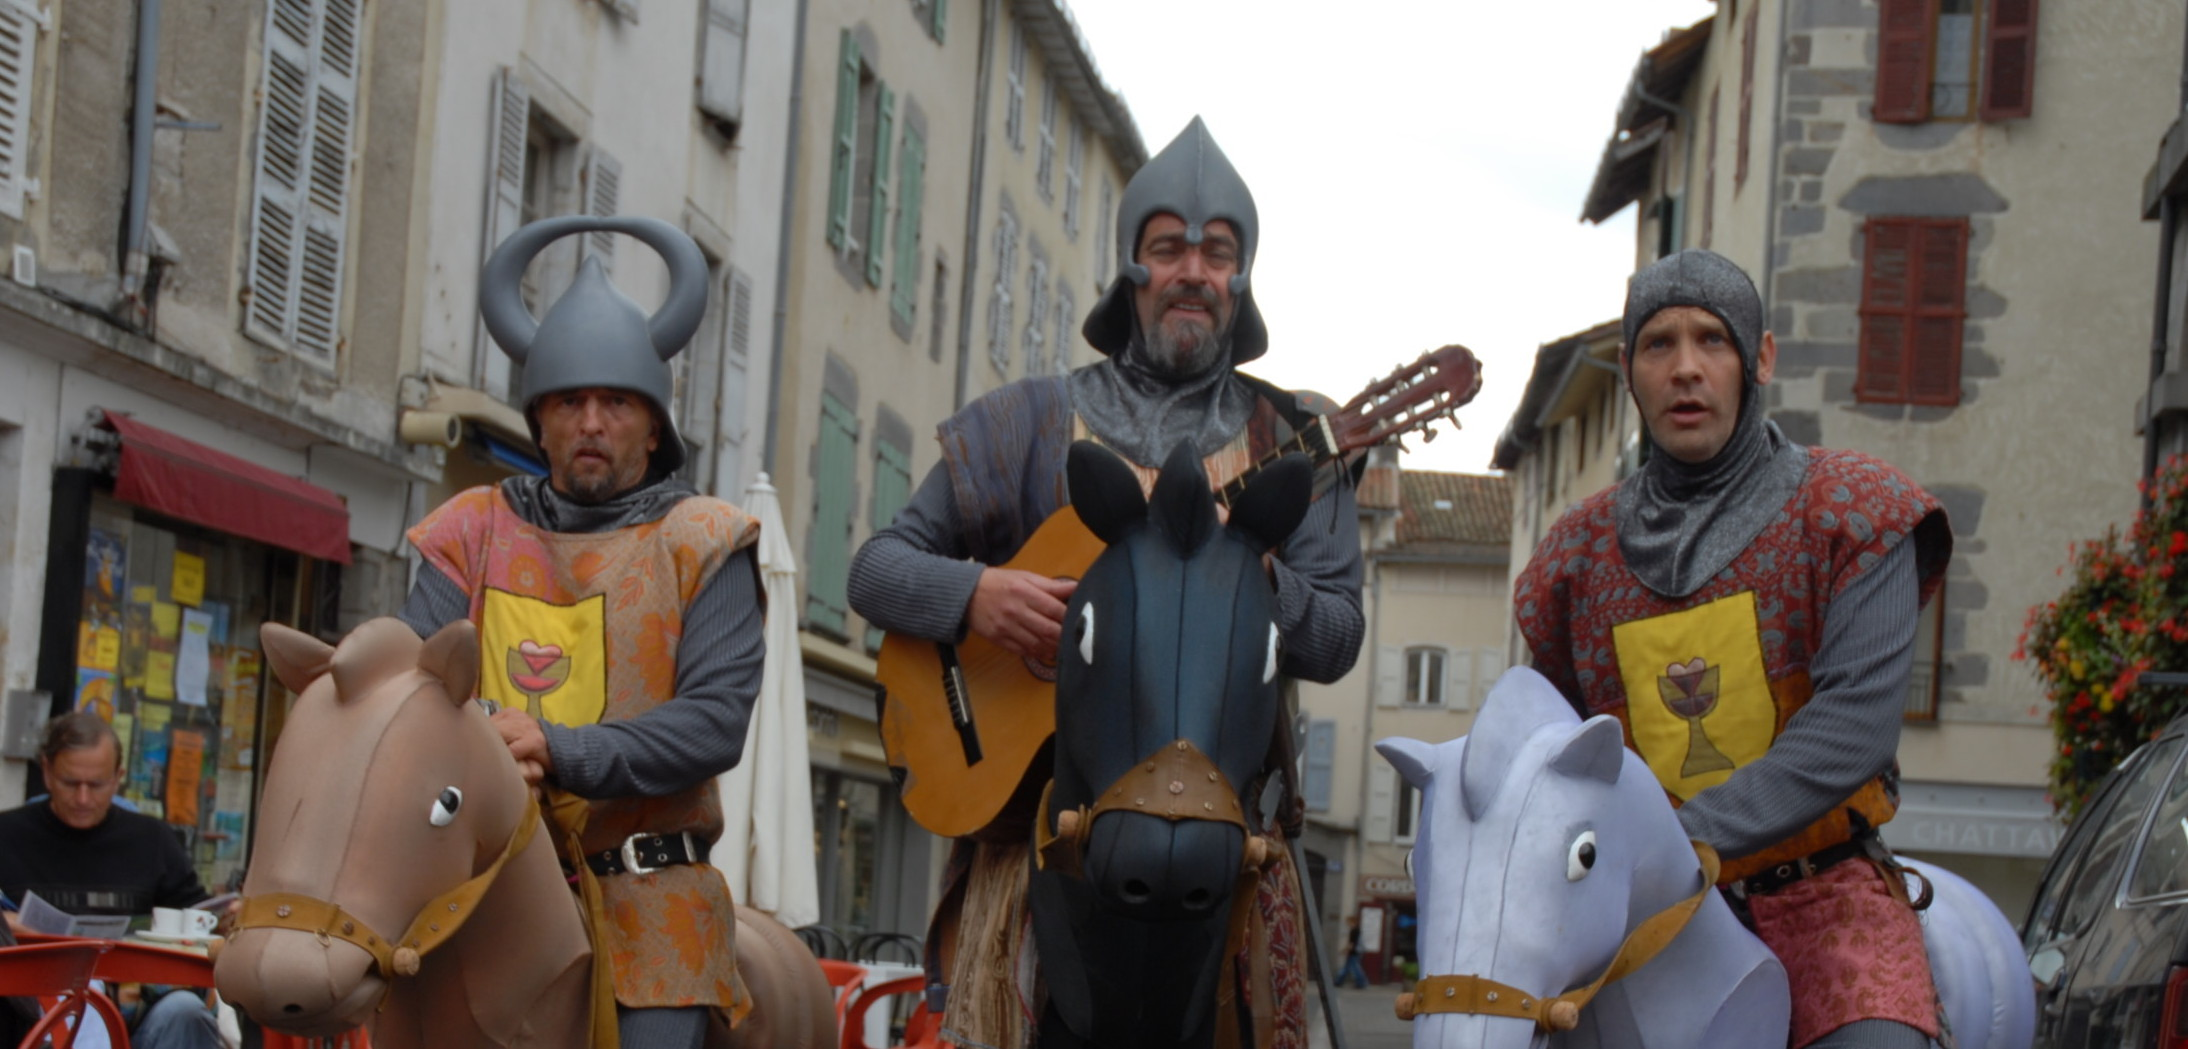 Graaleurs Acidu spectacle rue médiéval